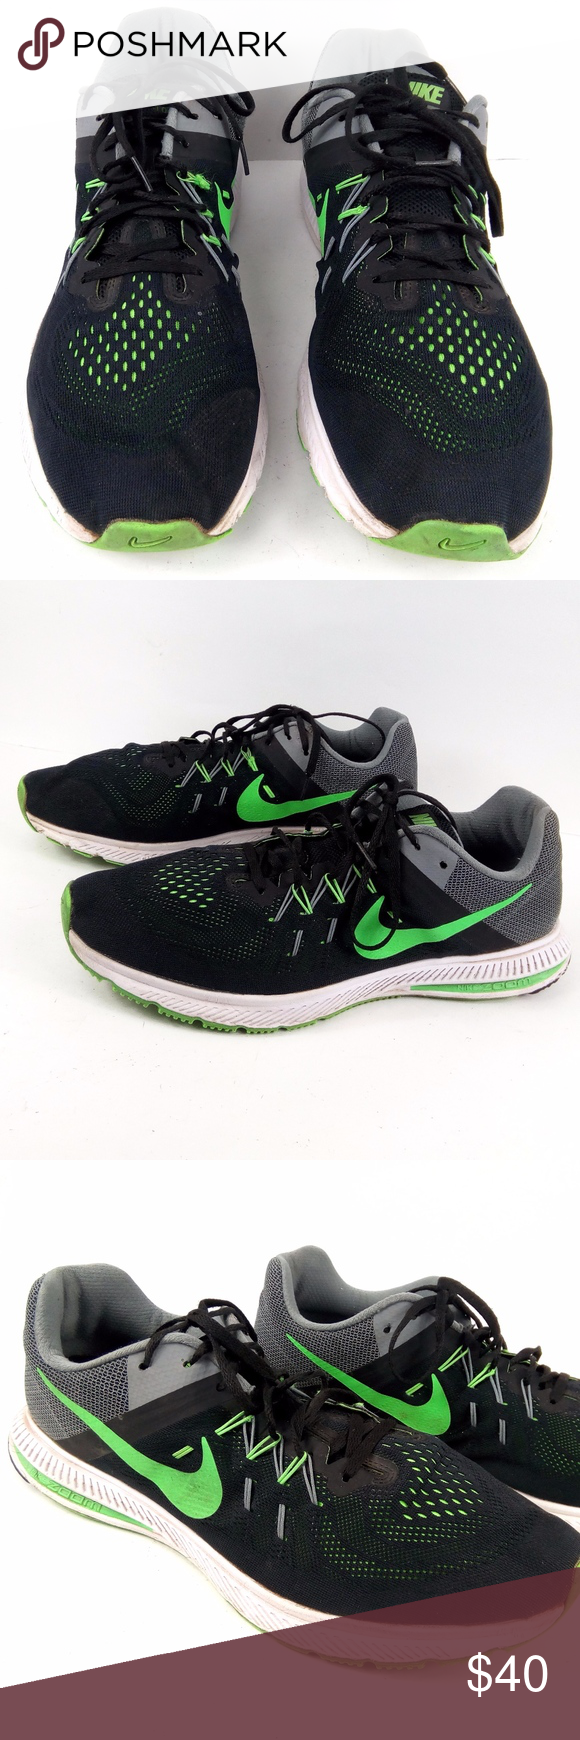 87b020c5c80dd Nike Zoom Winflo 2 sz 15 Black Green Running Shoes Nike Zoom Winflo 2 Men s